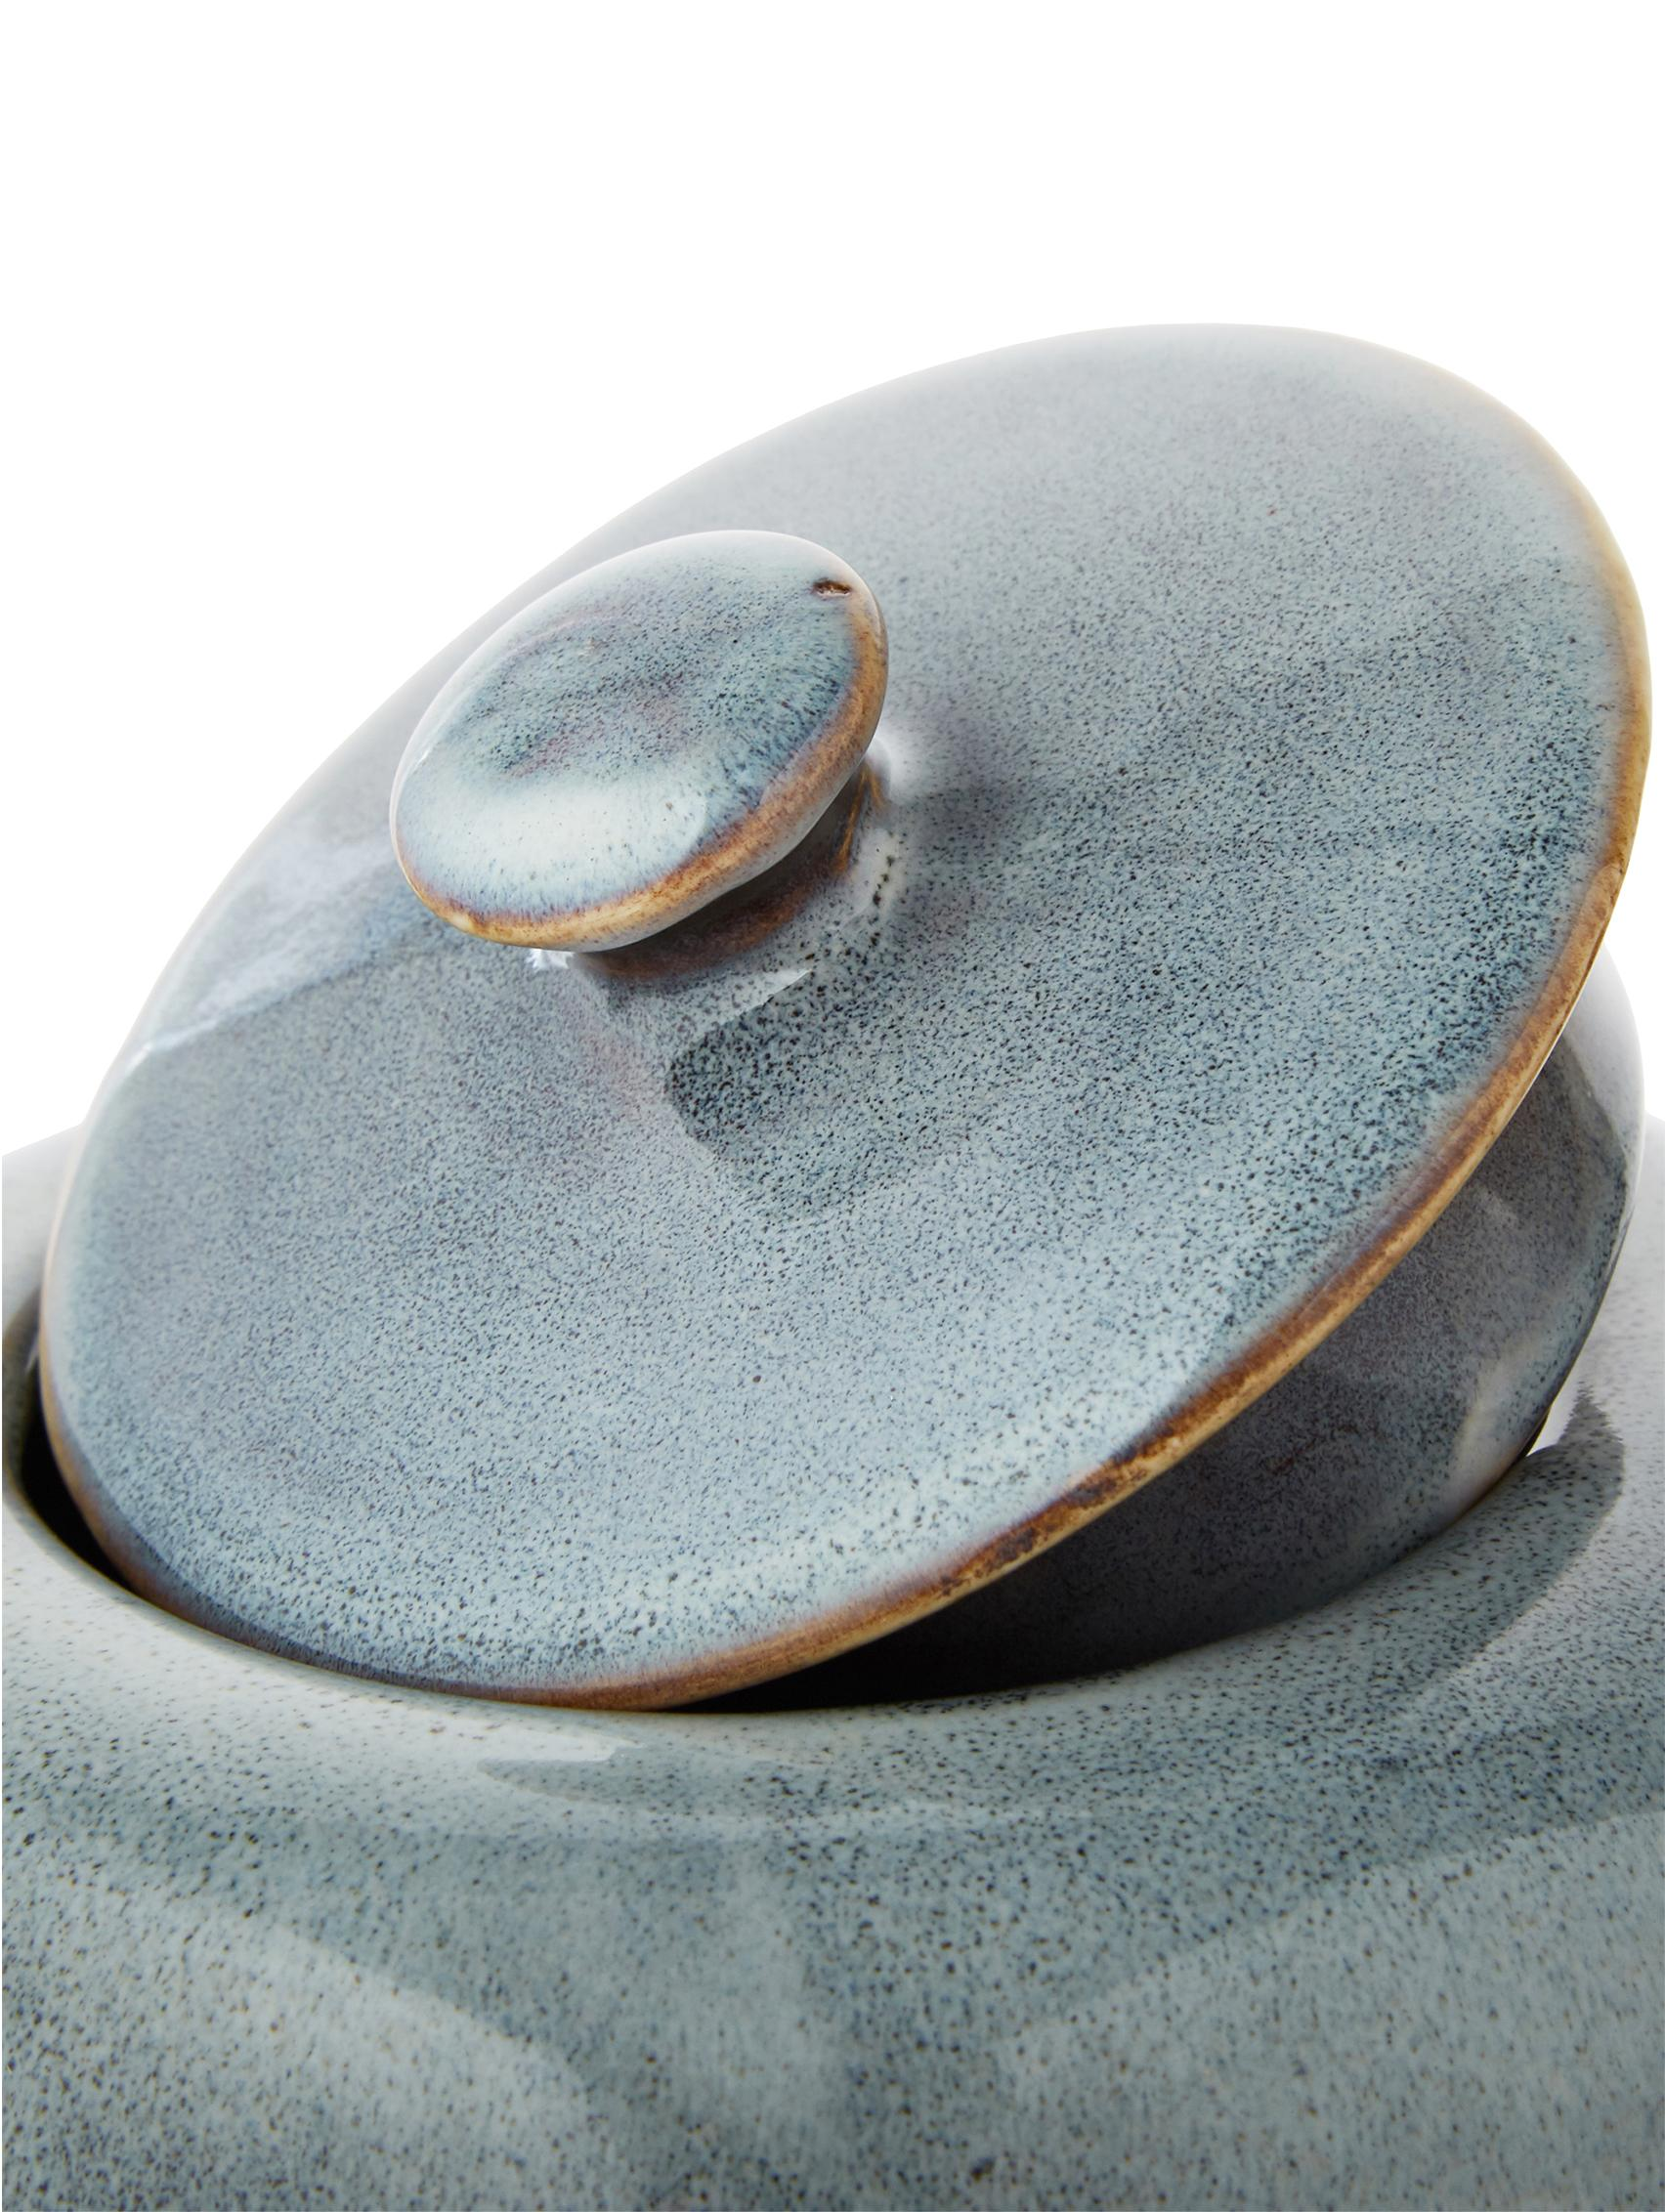 Teiera fatta a mano in terracotta Nordic Sea, Terracotta, Tonalità grigie e blu, 1 L